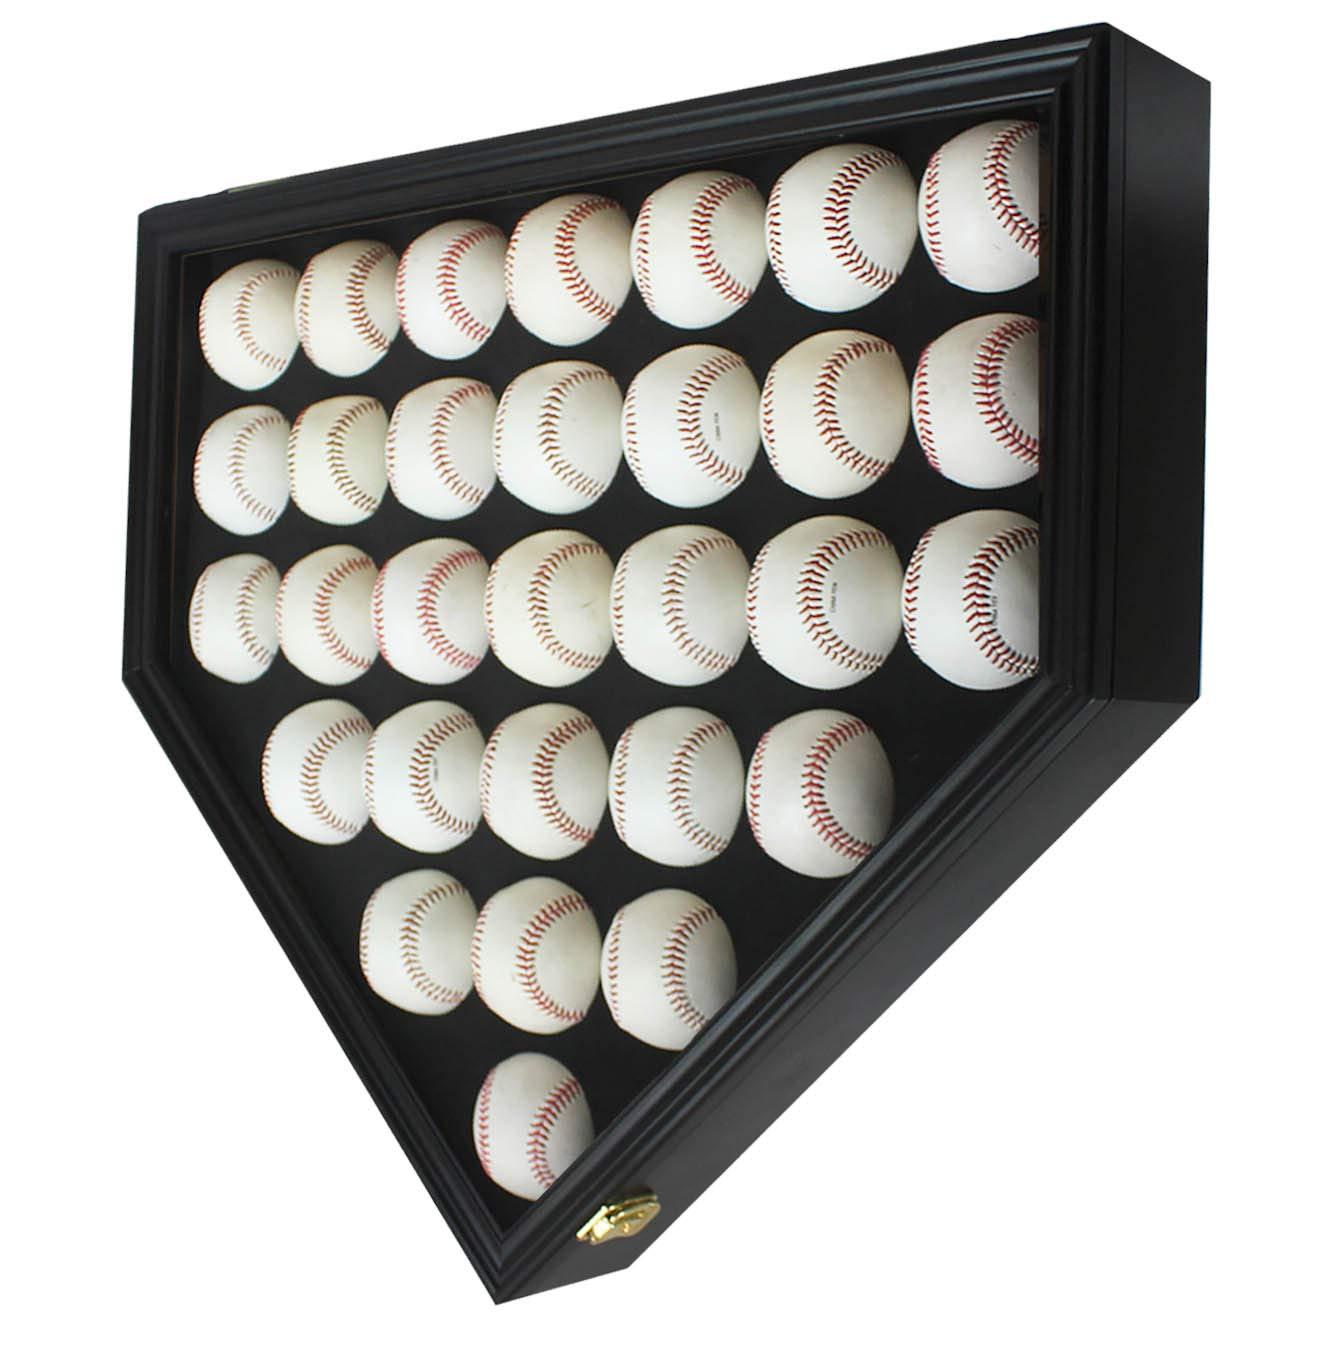 30 Baseball Display Case Wall Cabinet Shadow Box, UV Protection Door, B230(UV) (Black Finish) by DisplayGifts